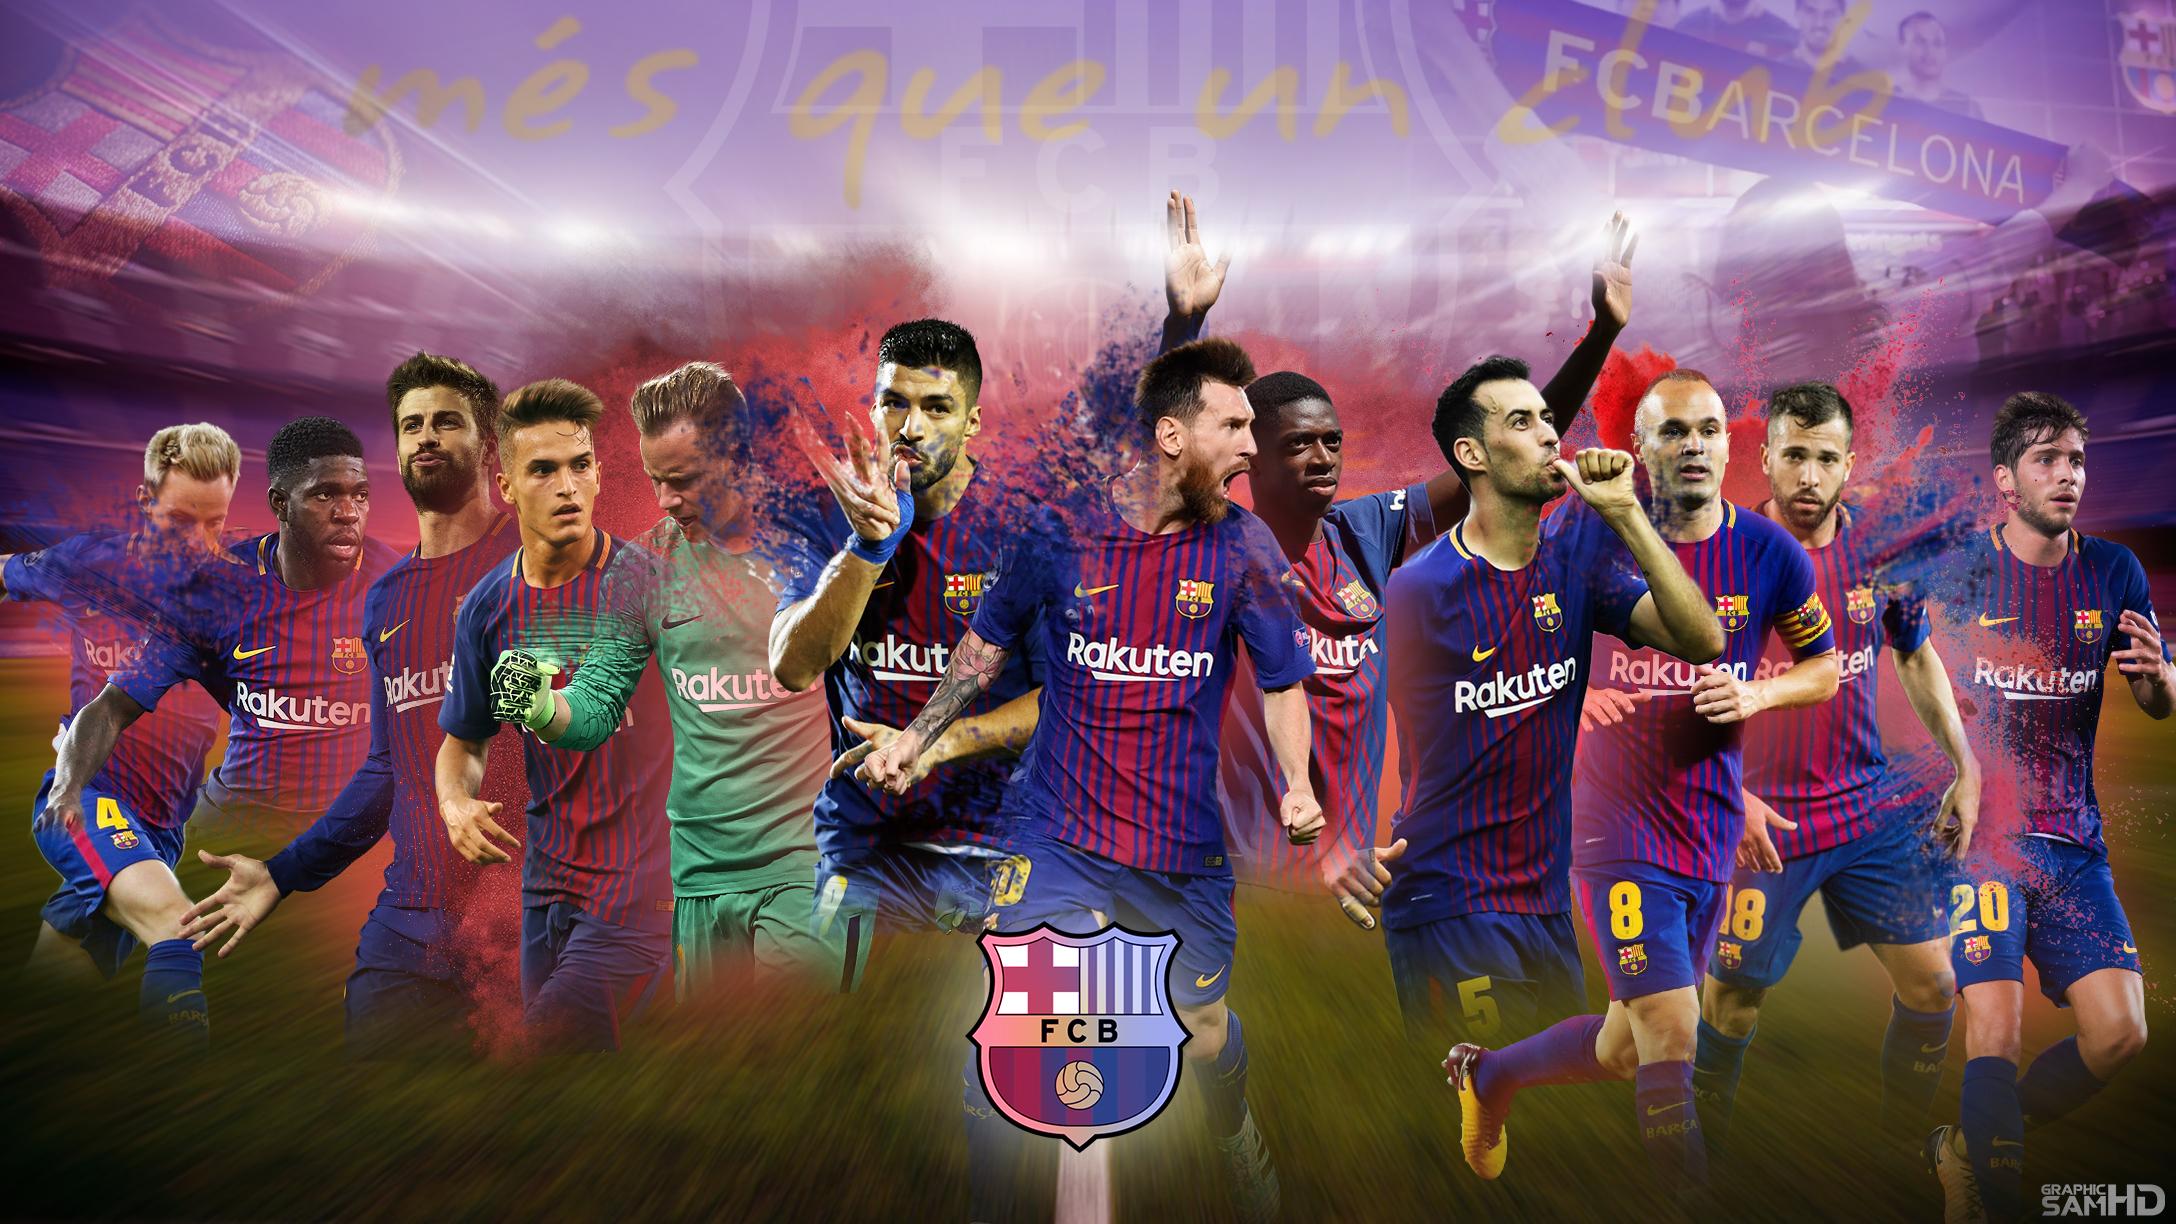 Fc Barcelona Desktop Wallpaper 2017 2018 By GraphicSamHD